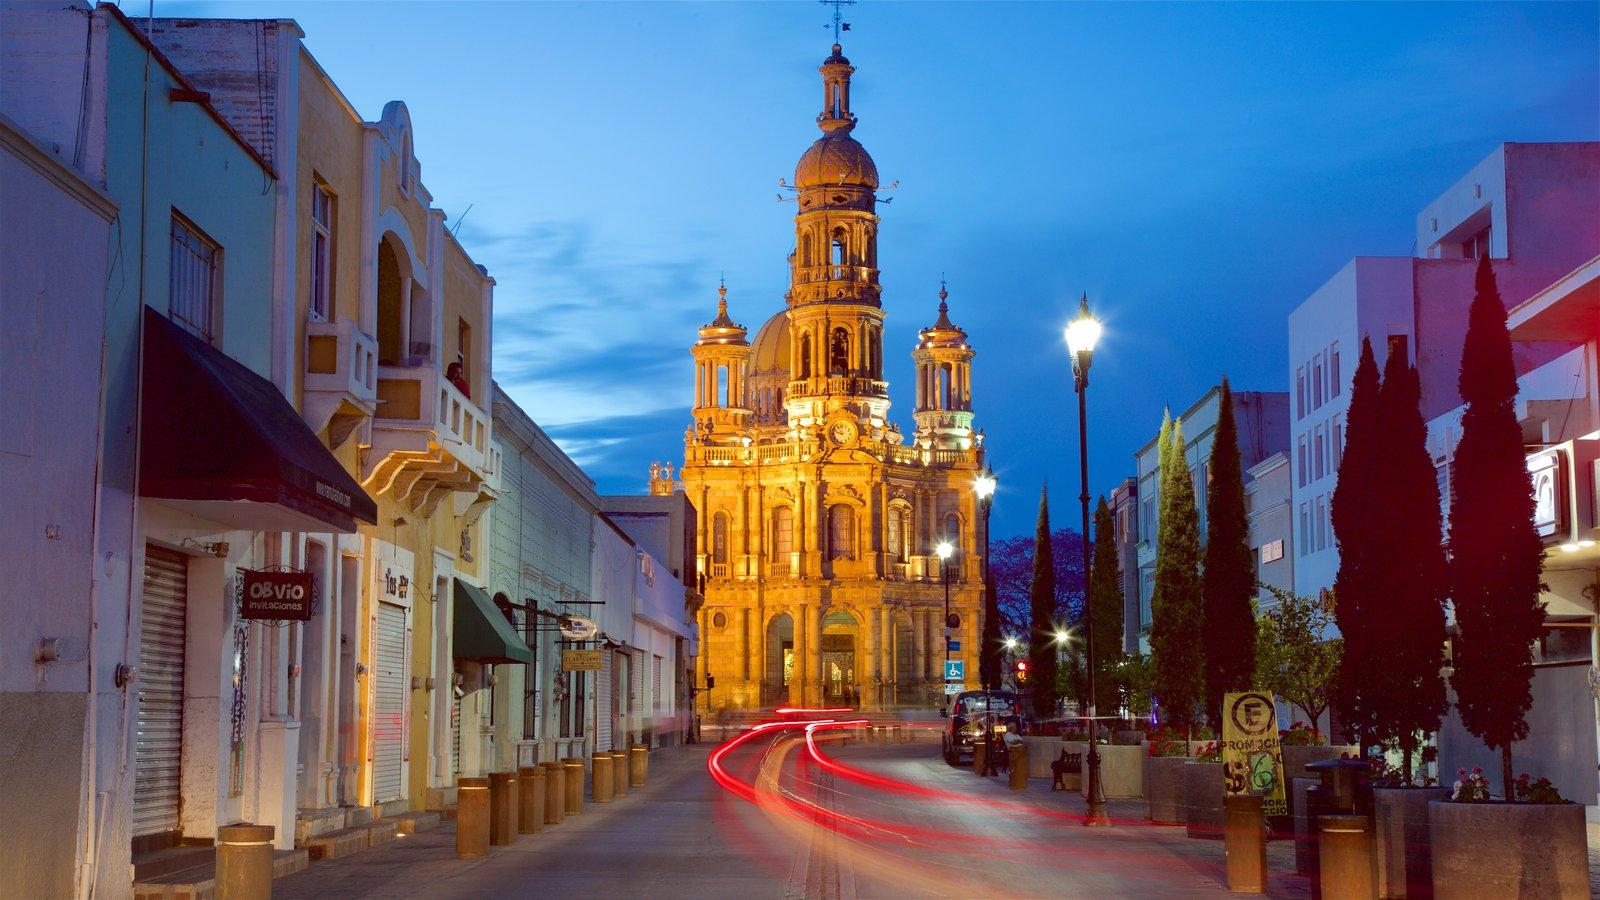 Plaza de Aguastaclientes